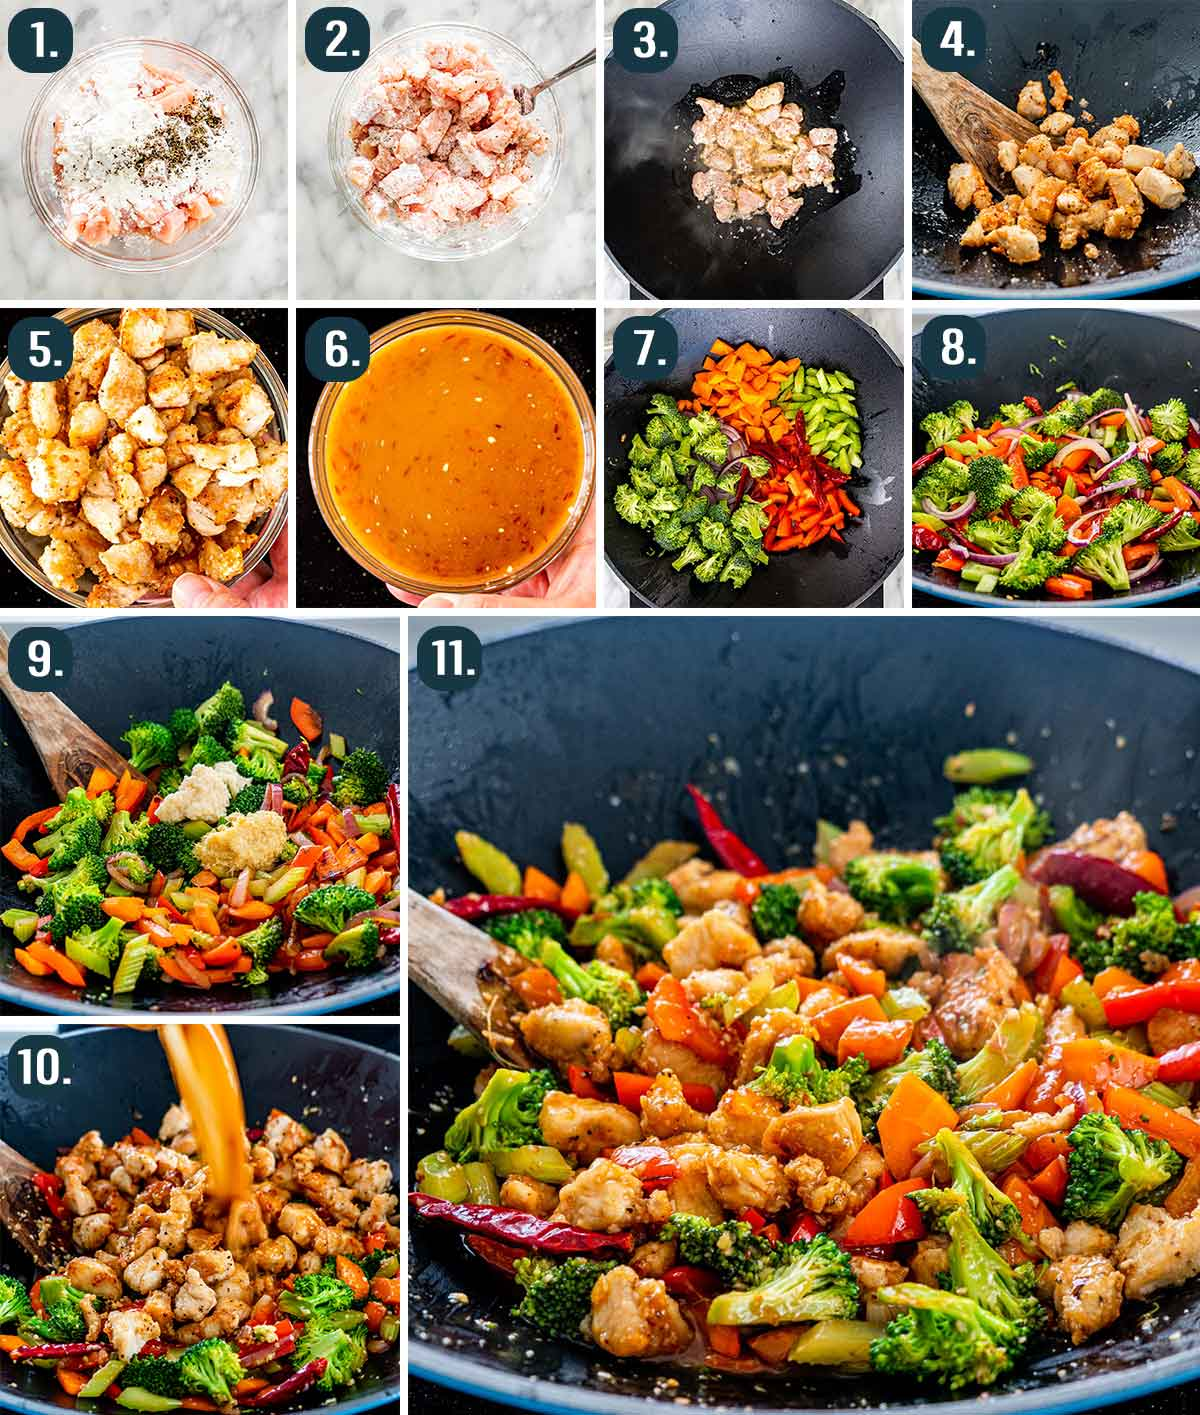 process shots showing how to easily make hunan chicken